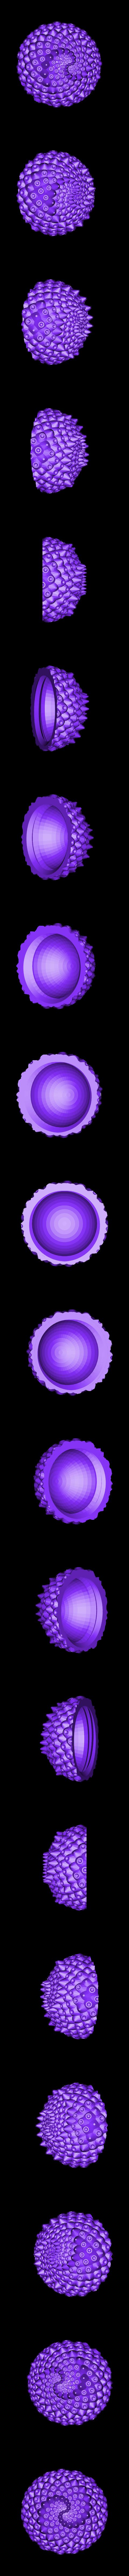 sphere_2_up.stl Download free STL file Dragon Egg Boxes • 3D print object, ferjerez3d